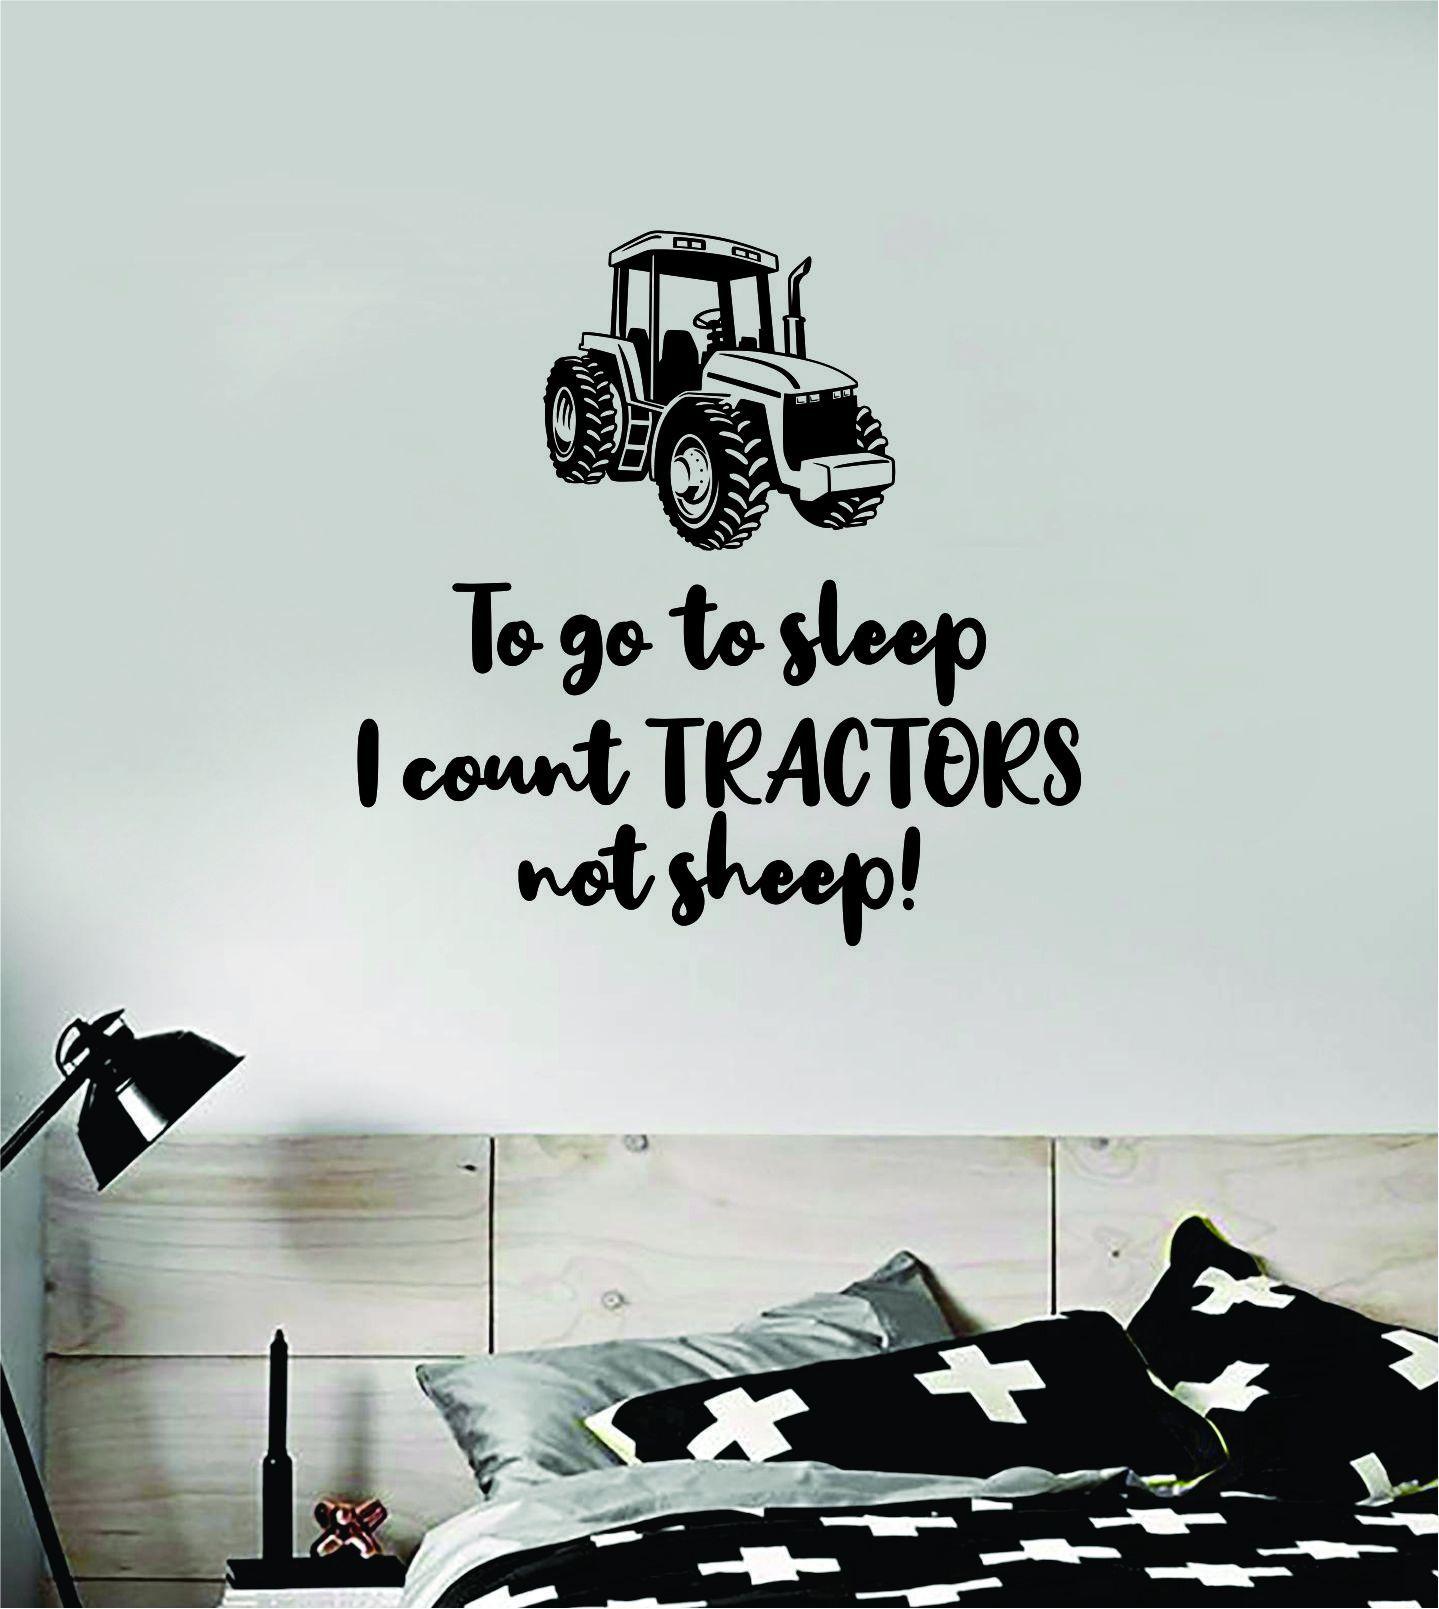 Sleep Tractors Sheep Wall Decal Sticker Vinyl Art Bedroom Room Decor Teen Quote Inspirational Baby Nursery Son Daughter Kids Farm - brown